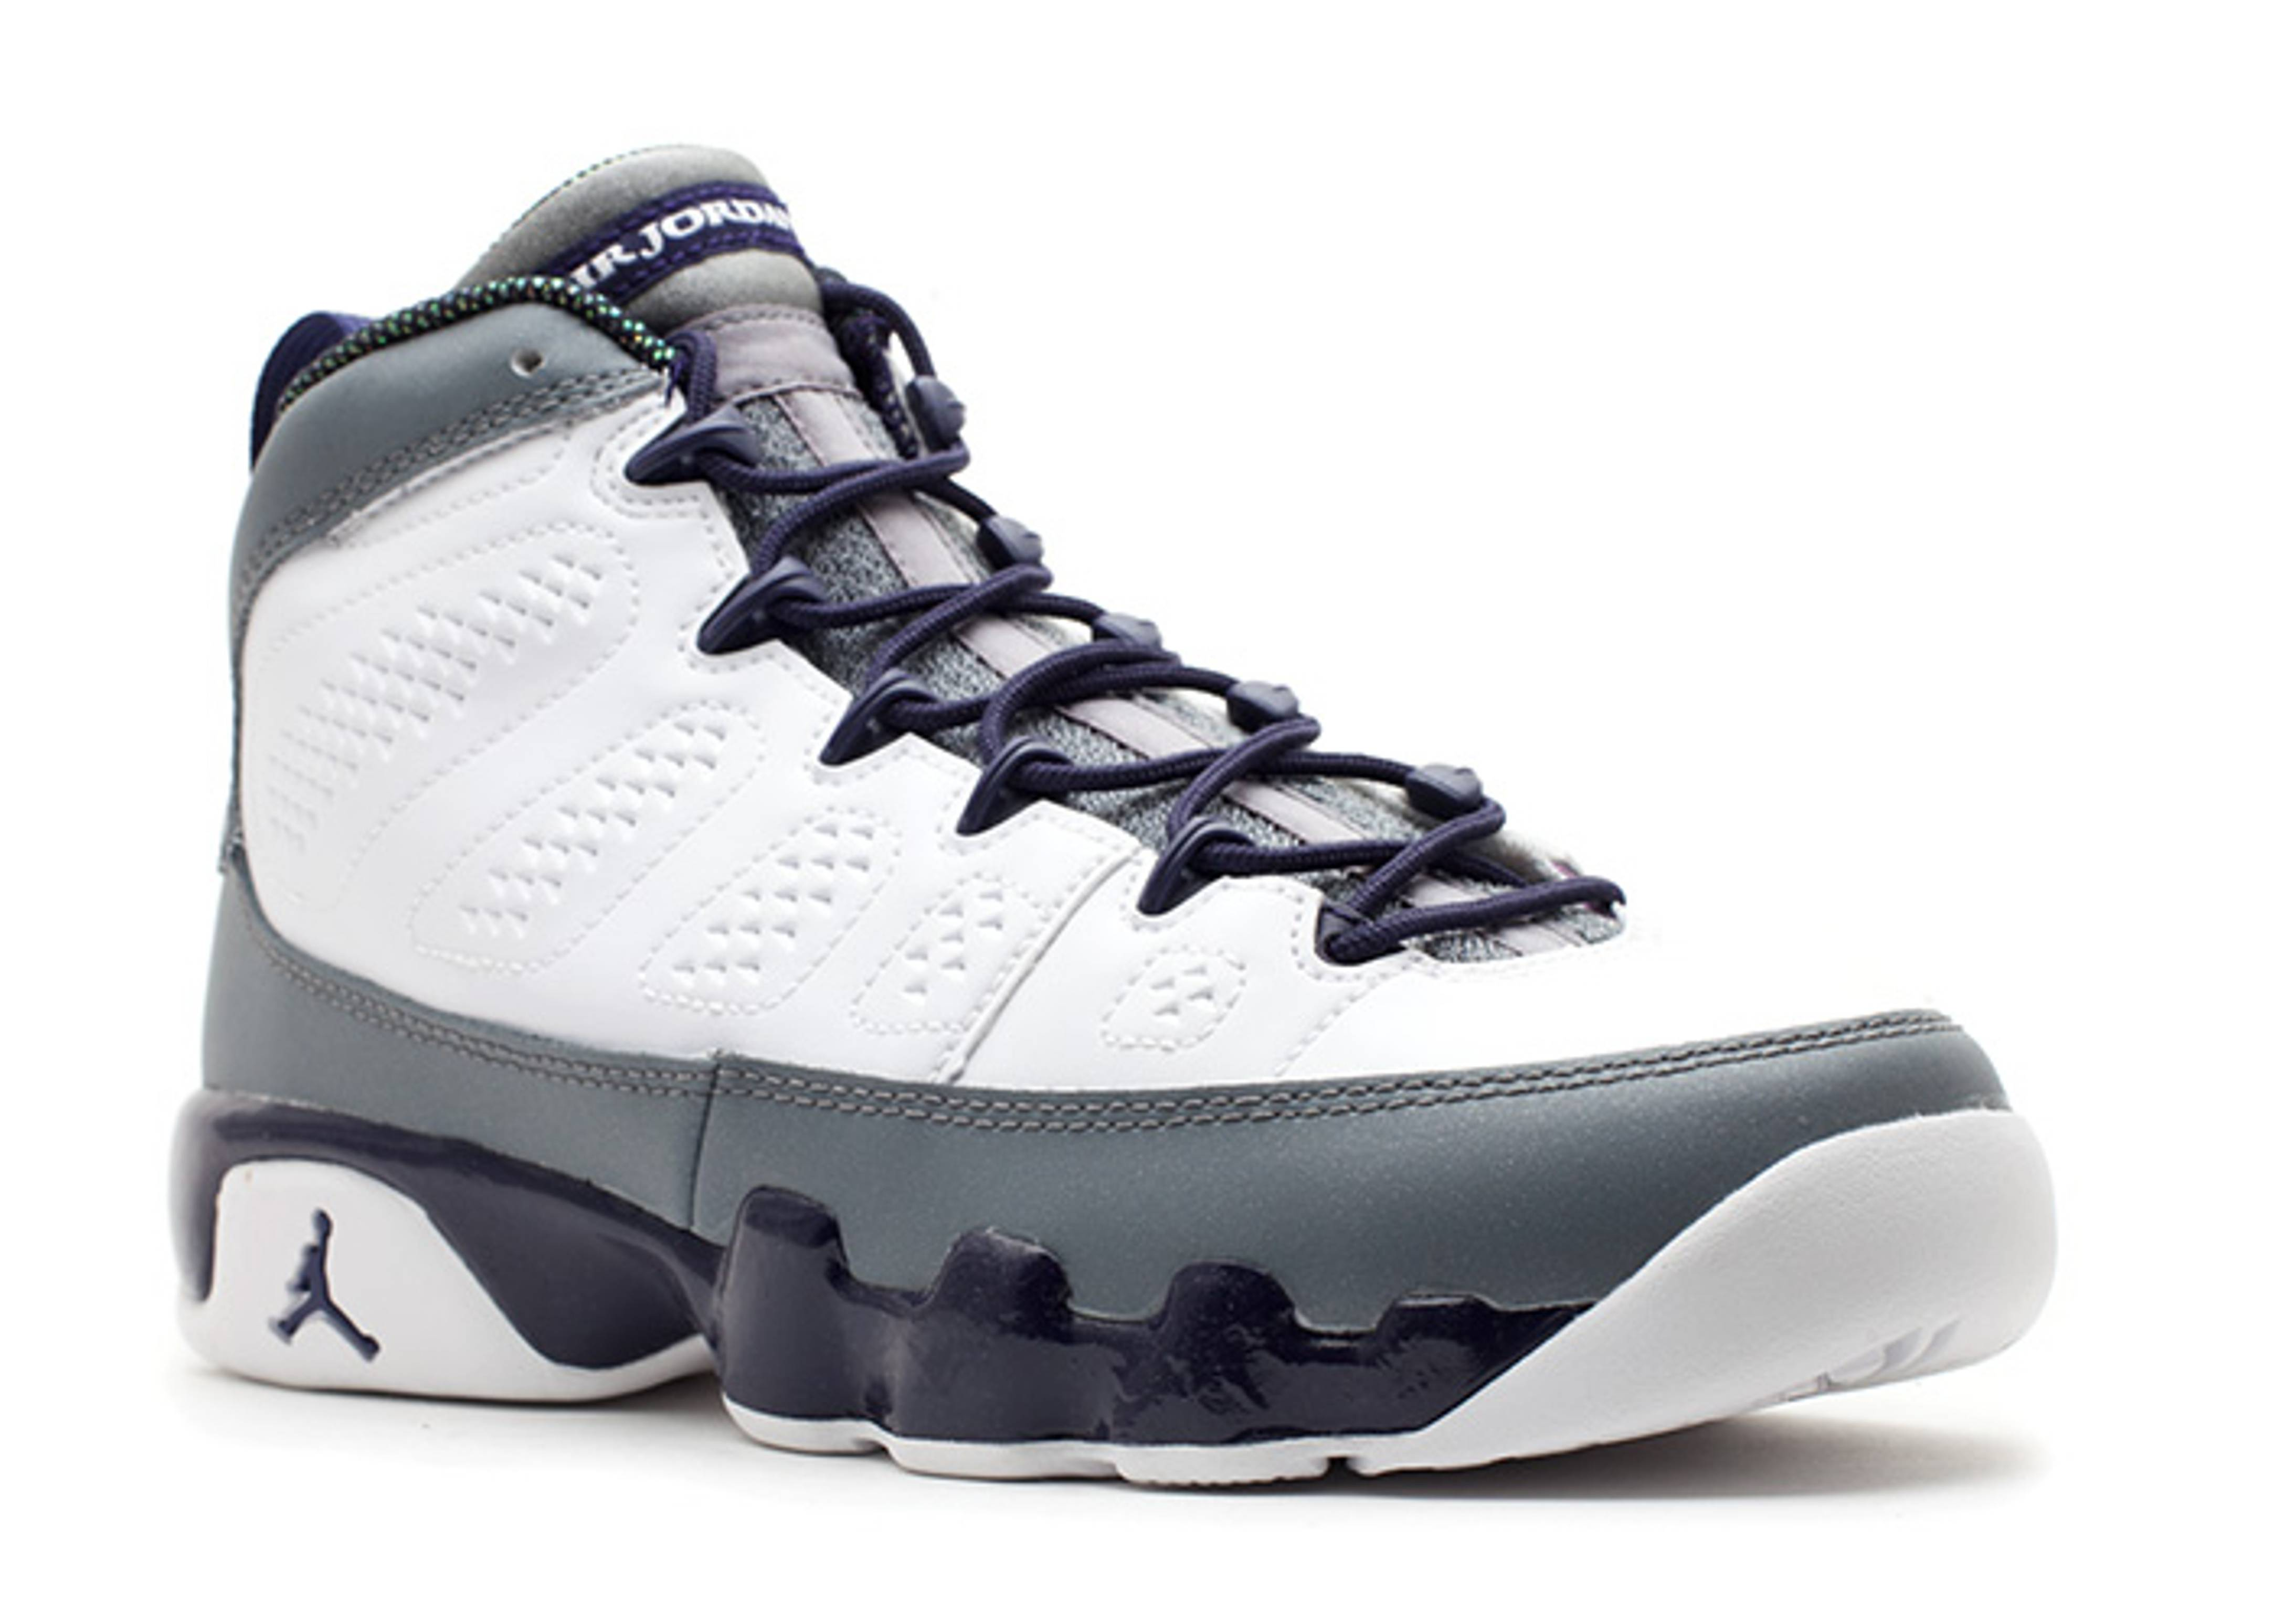 fcb886f01f1 Girls Air Jordan 9 Retro (gs) - Air Jordan - 537736 109 - white/imperial  purple-cl grey | Flight Club